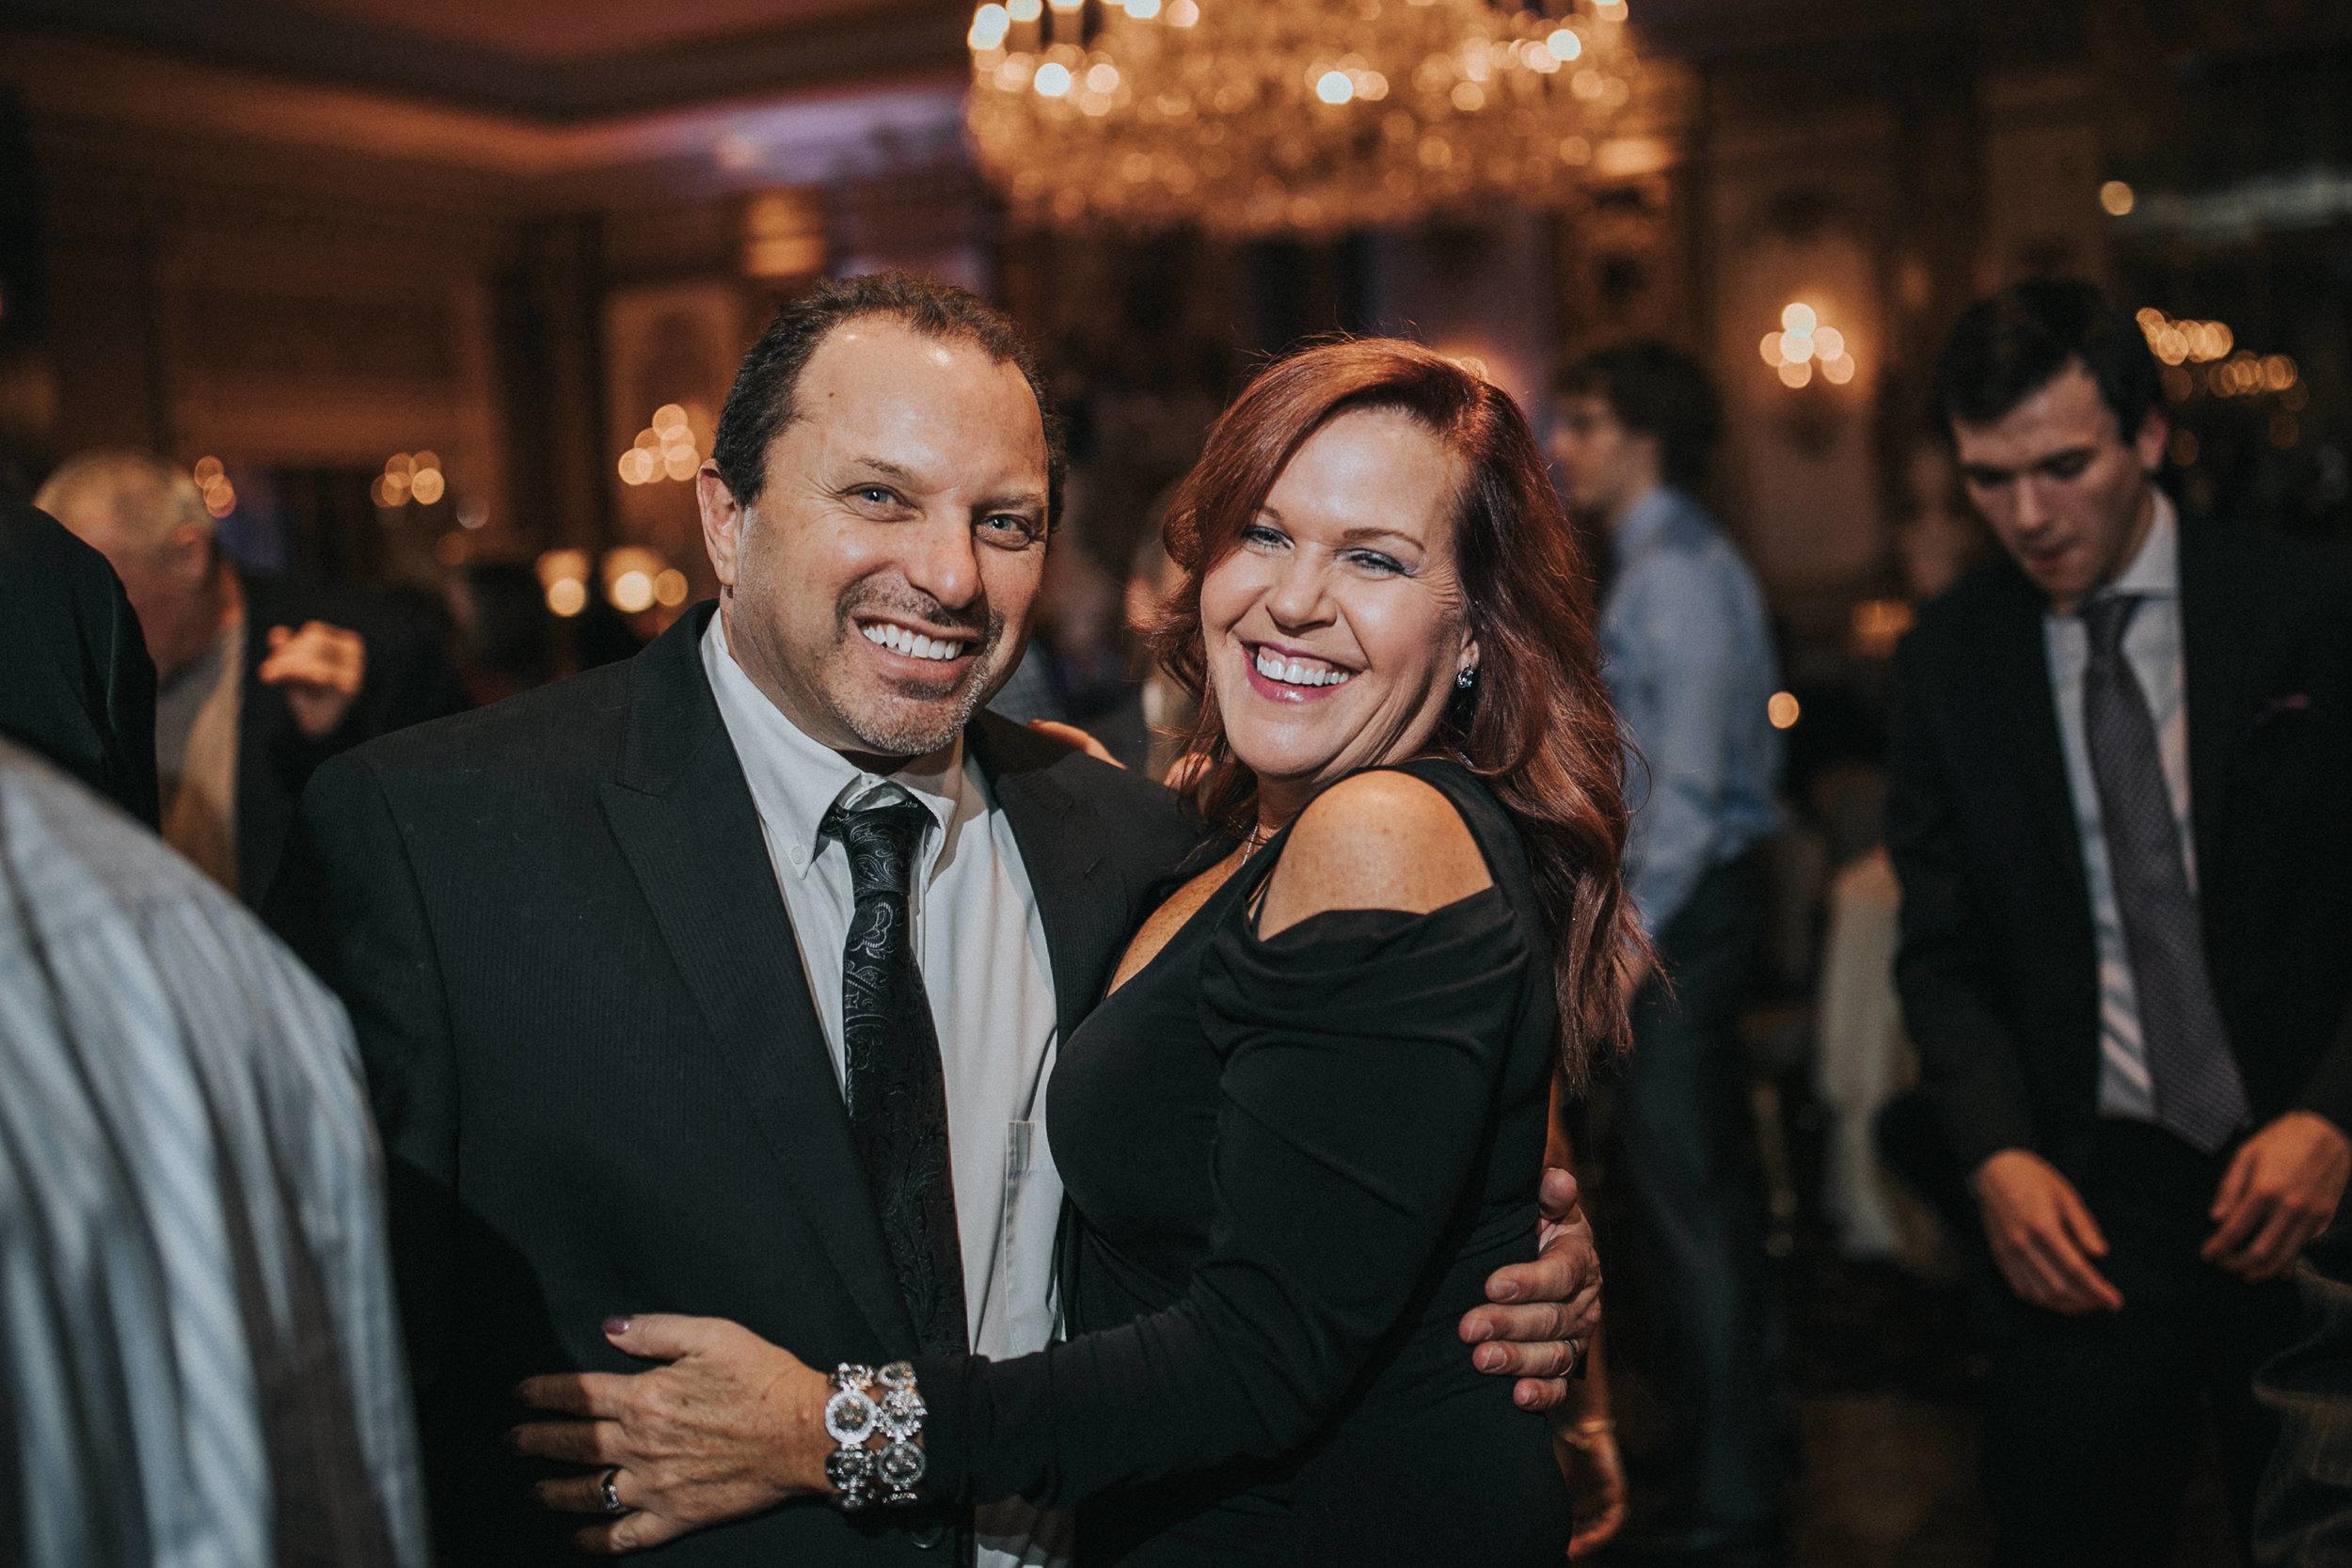 New-Jersey-Wedding-Photography-Fishers-Tudor-House-JennaLynnPhotography-Reception-Kathleen&Eddie-130.jpg